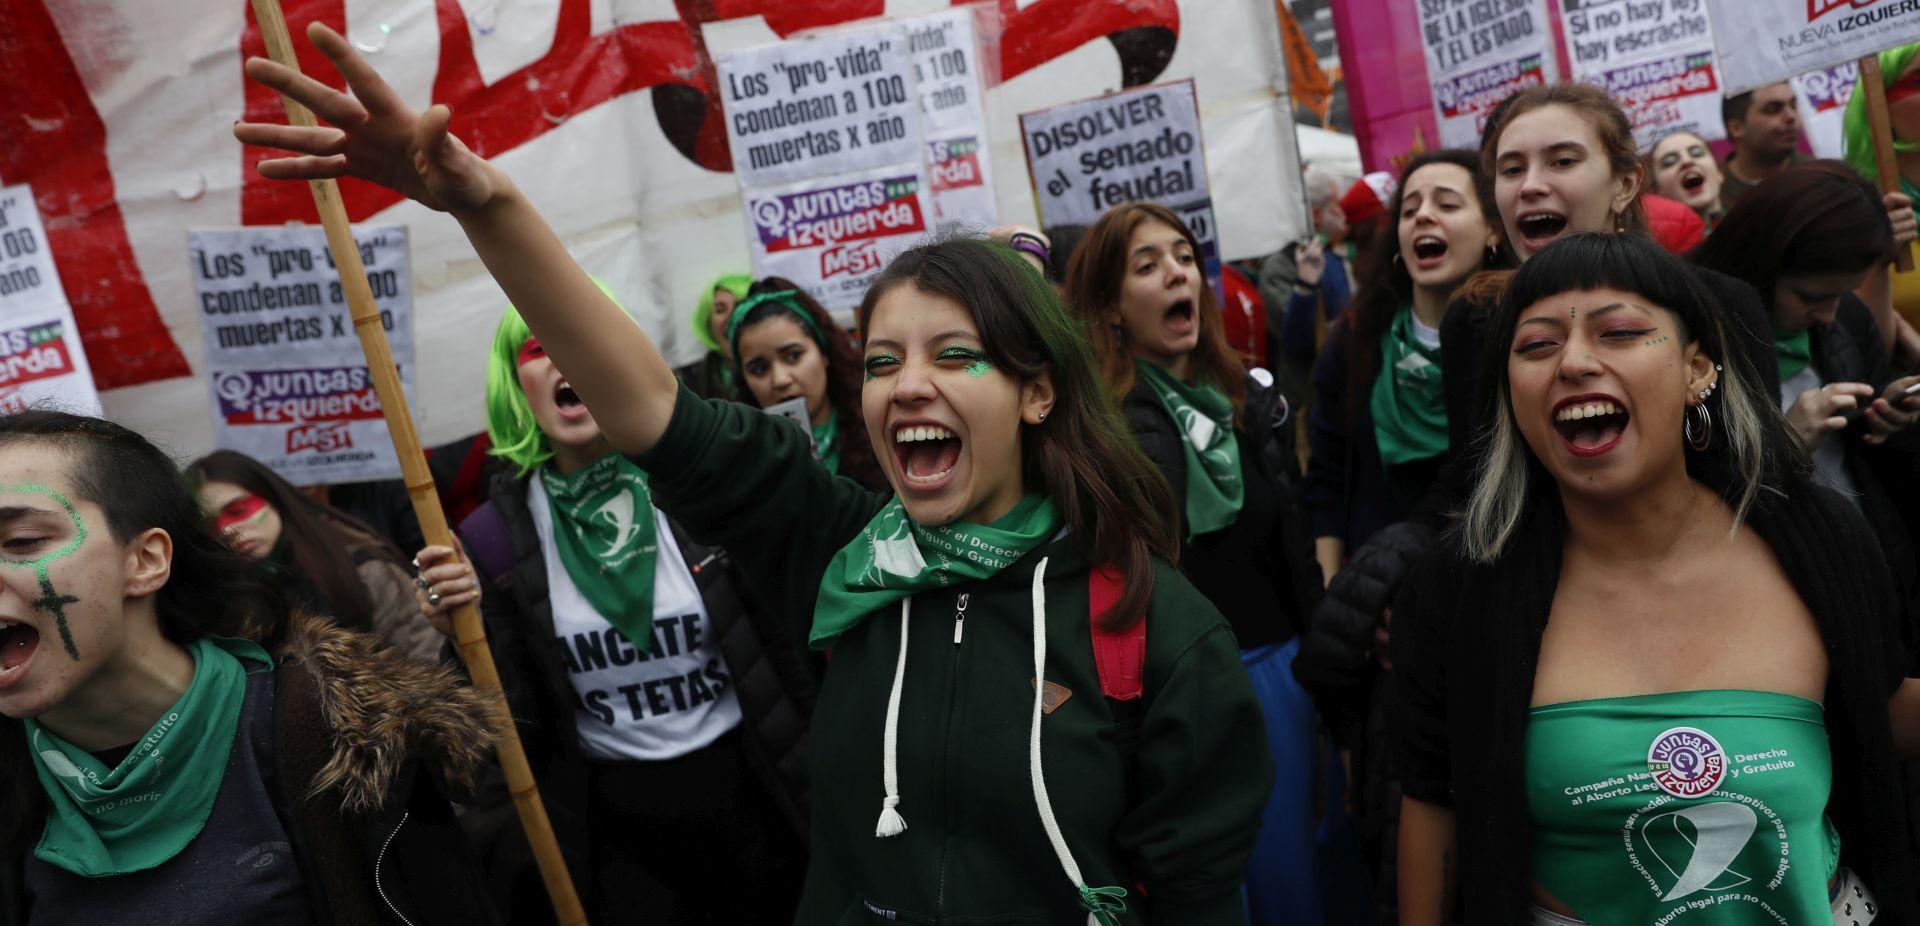 Argentnski Senat glasao protiv legalizacije pobačaja